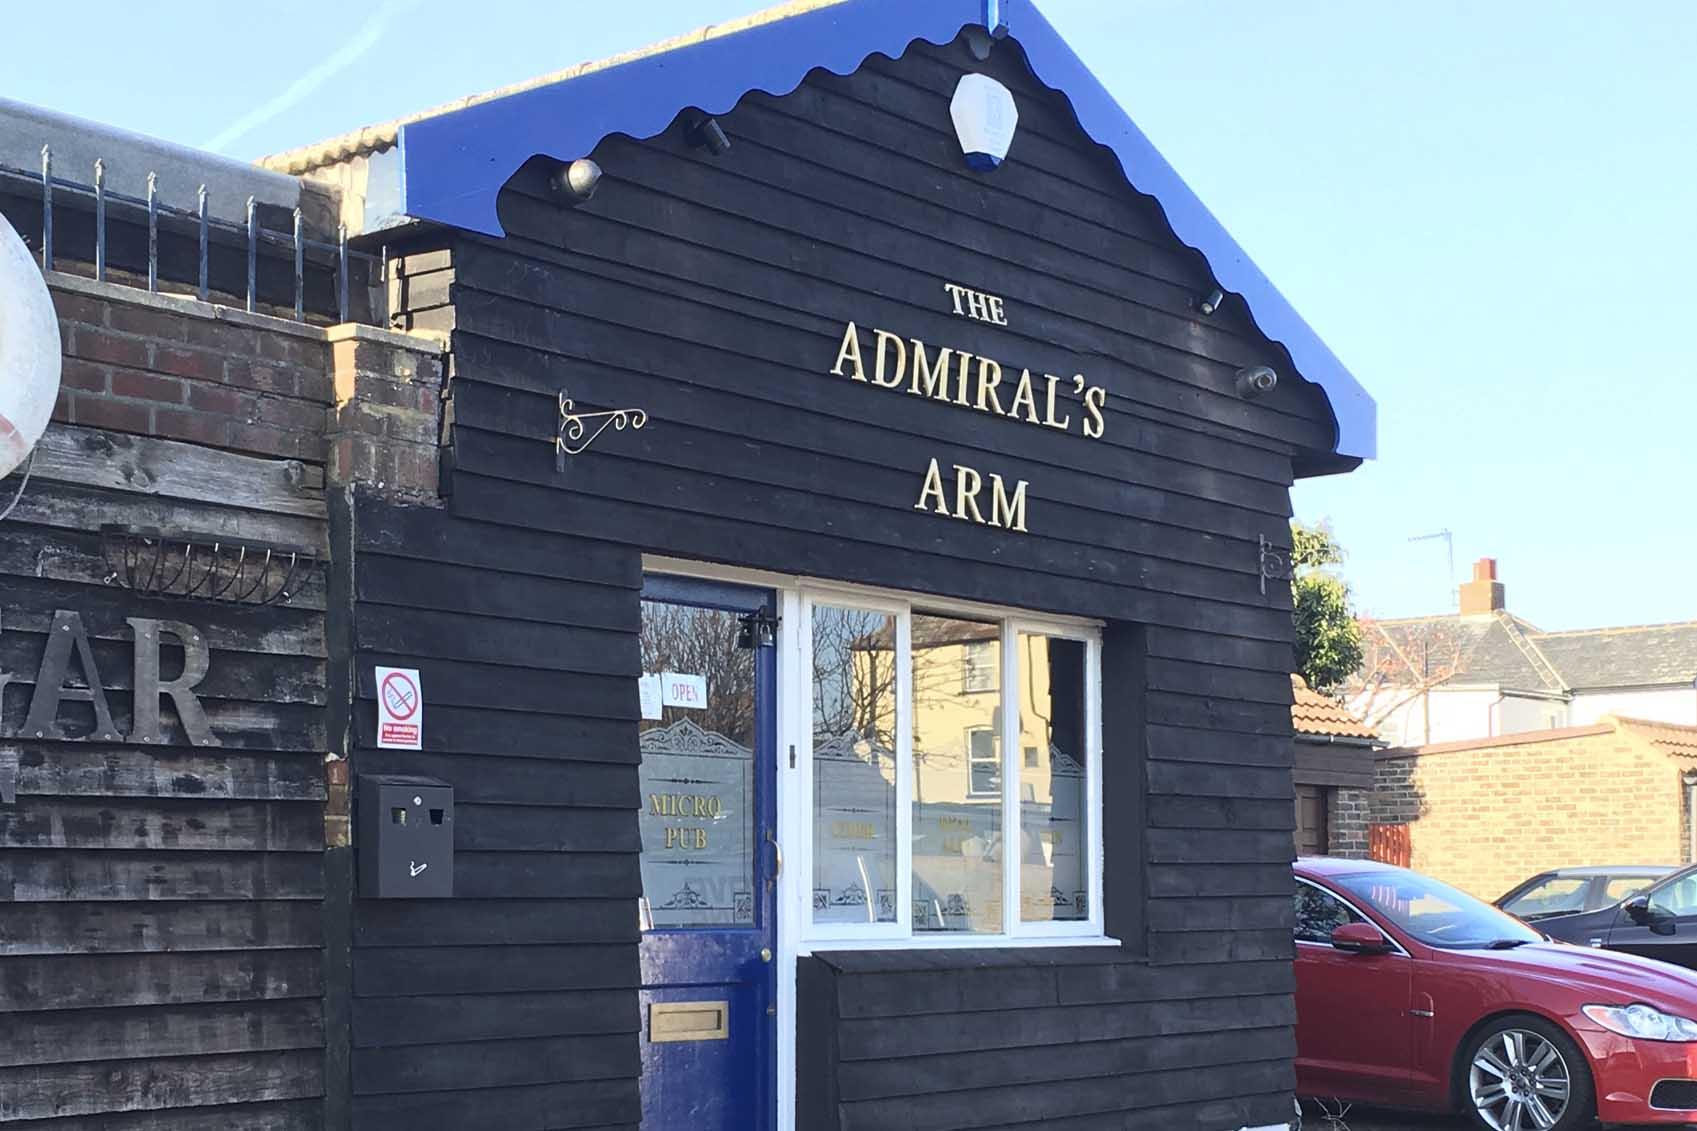 Adrmiral's pub